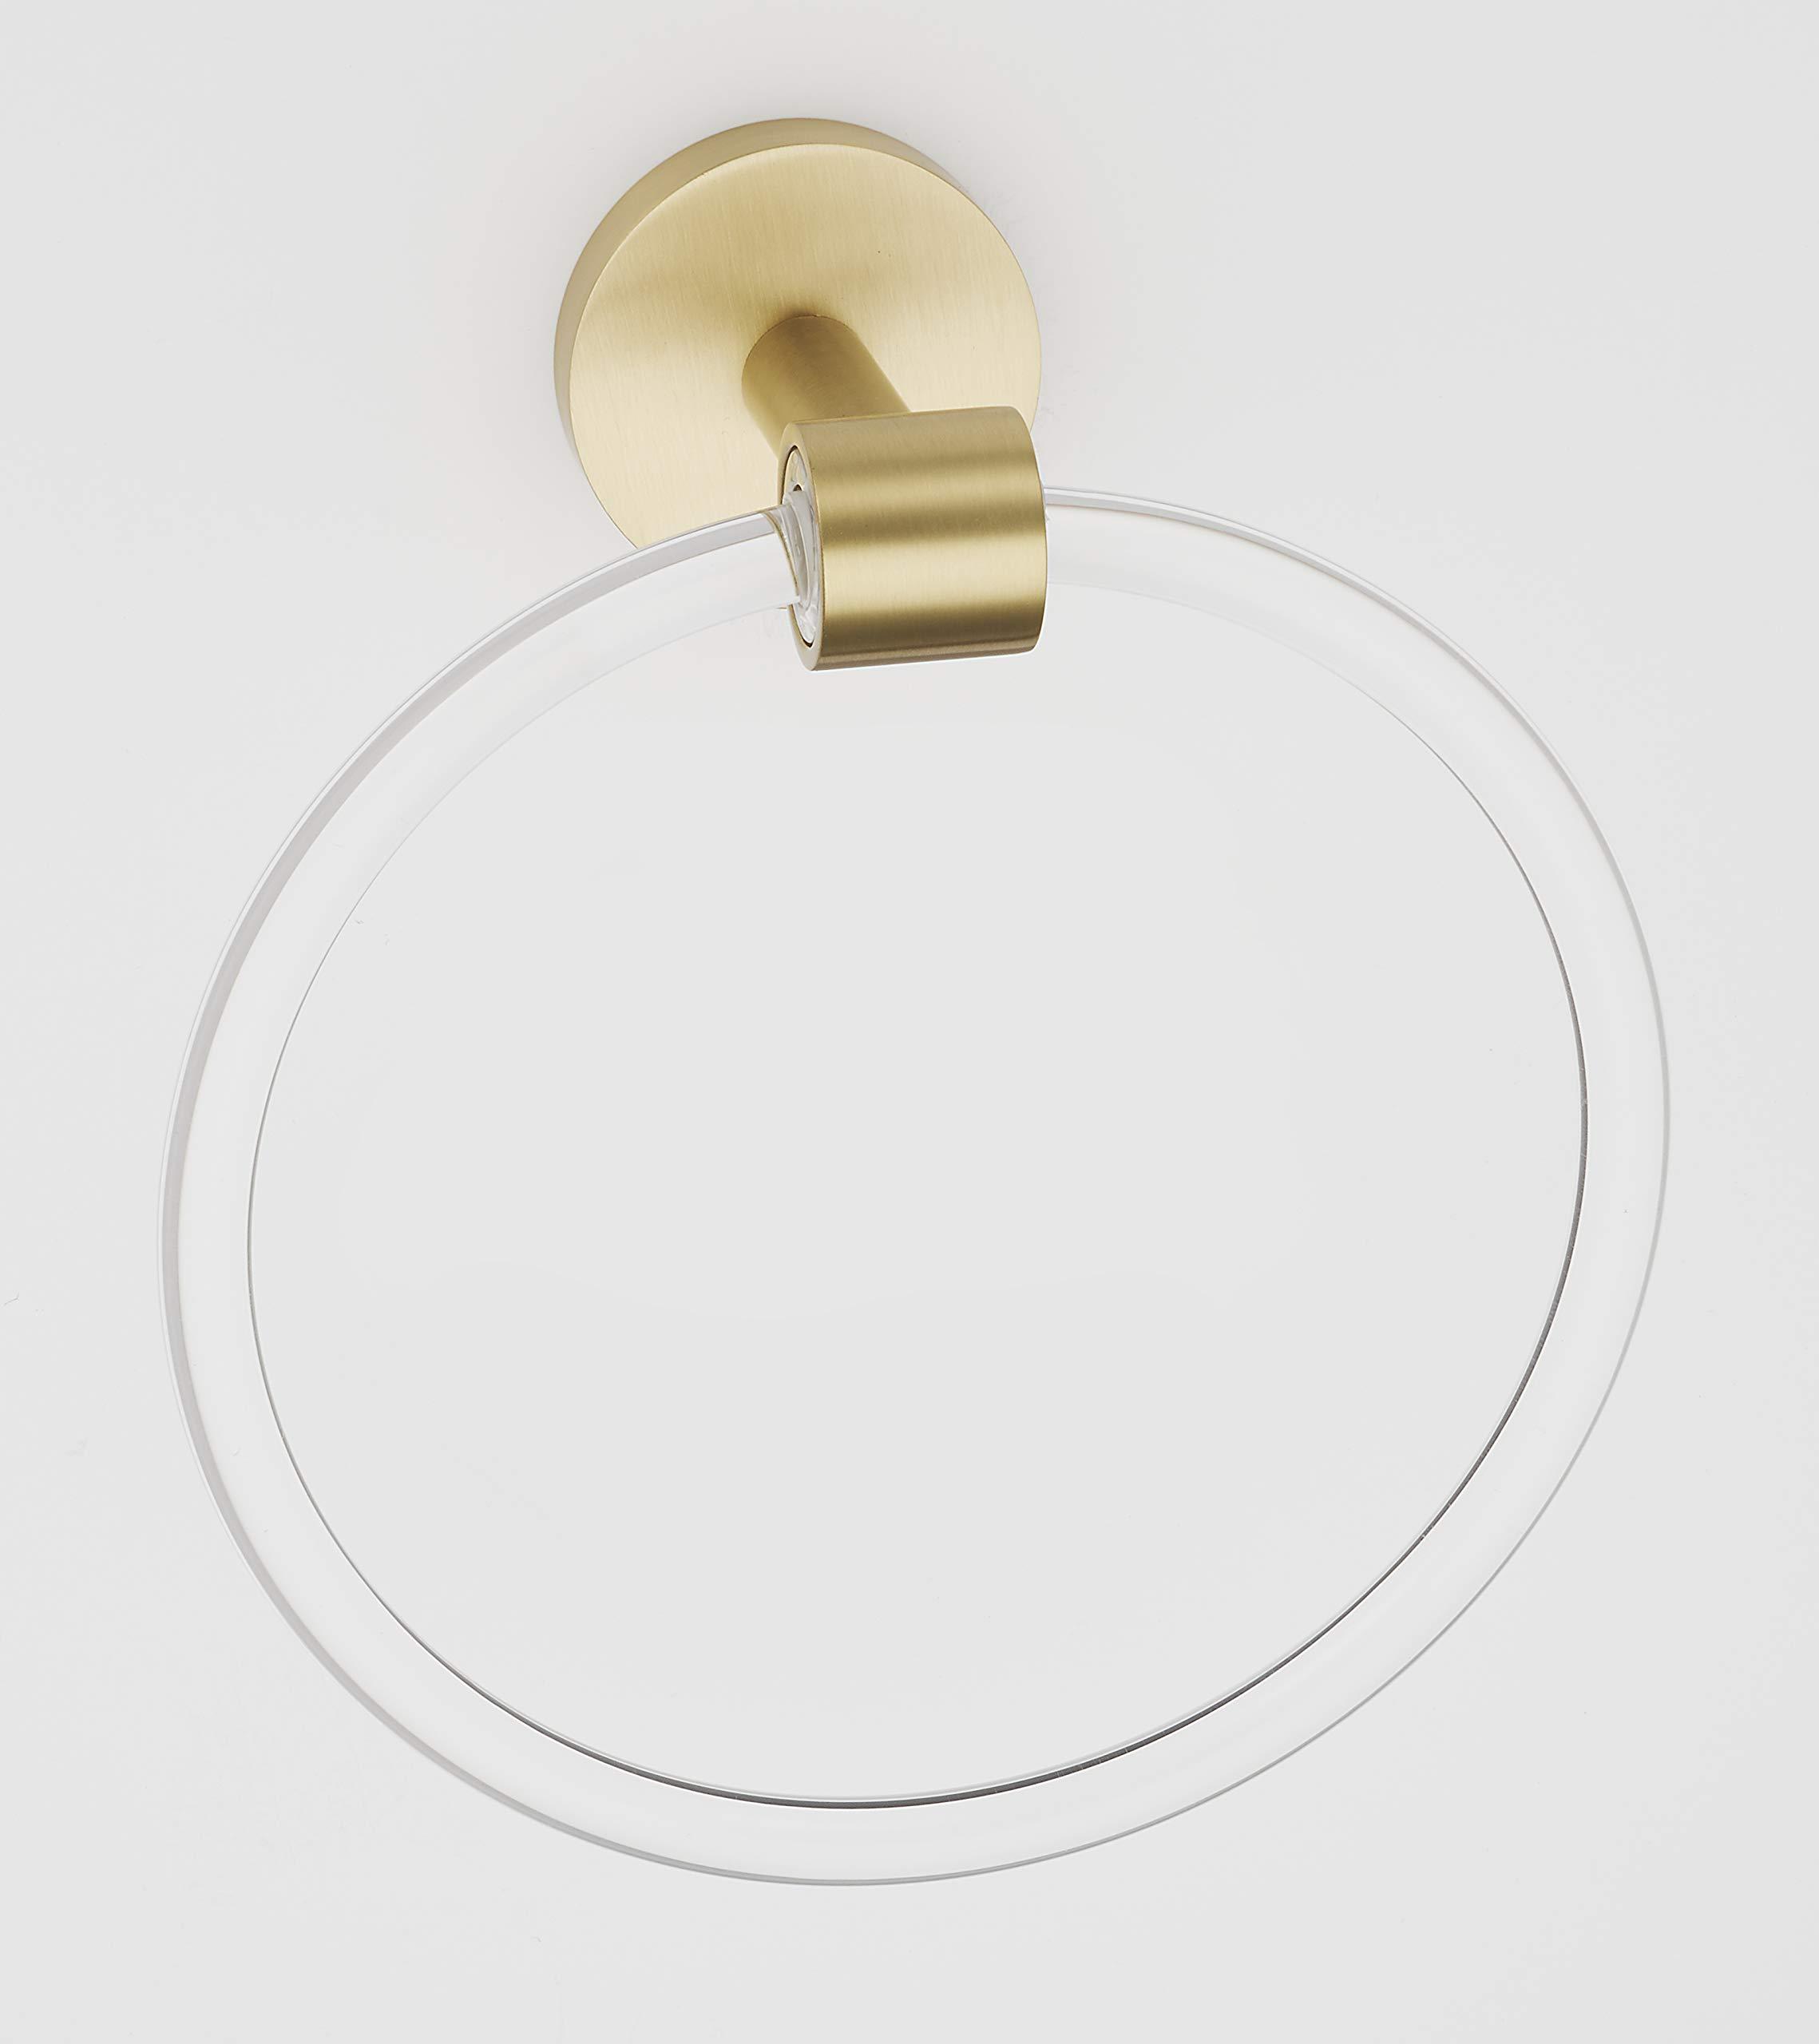 Alno A7240-SB Contemporary Acrylic 6 Inch Diameter Towel Ring